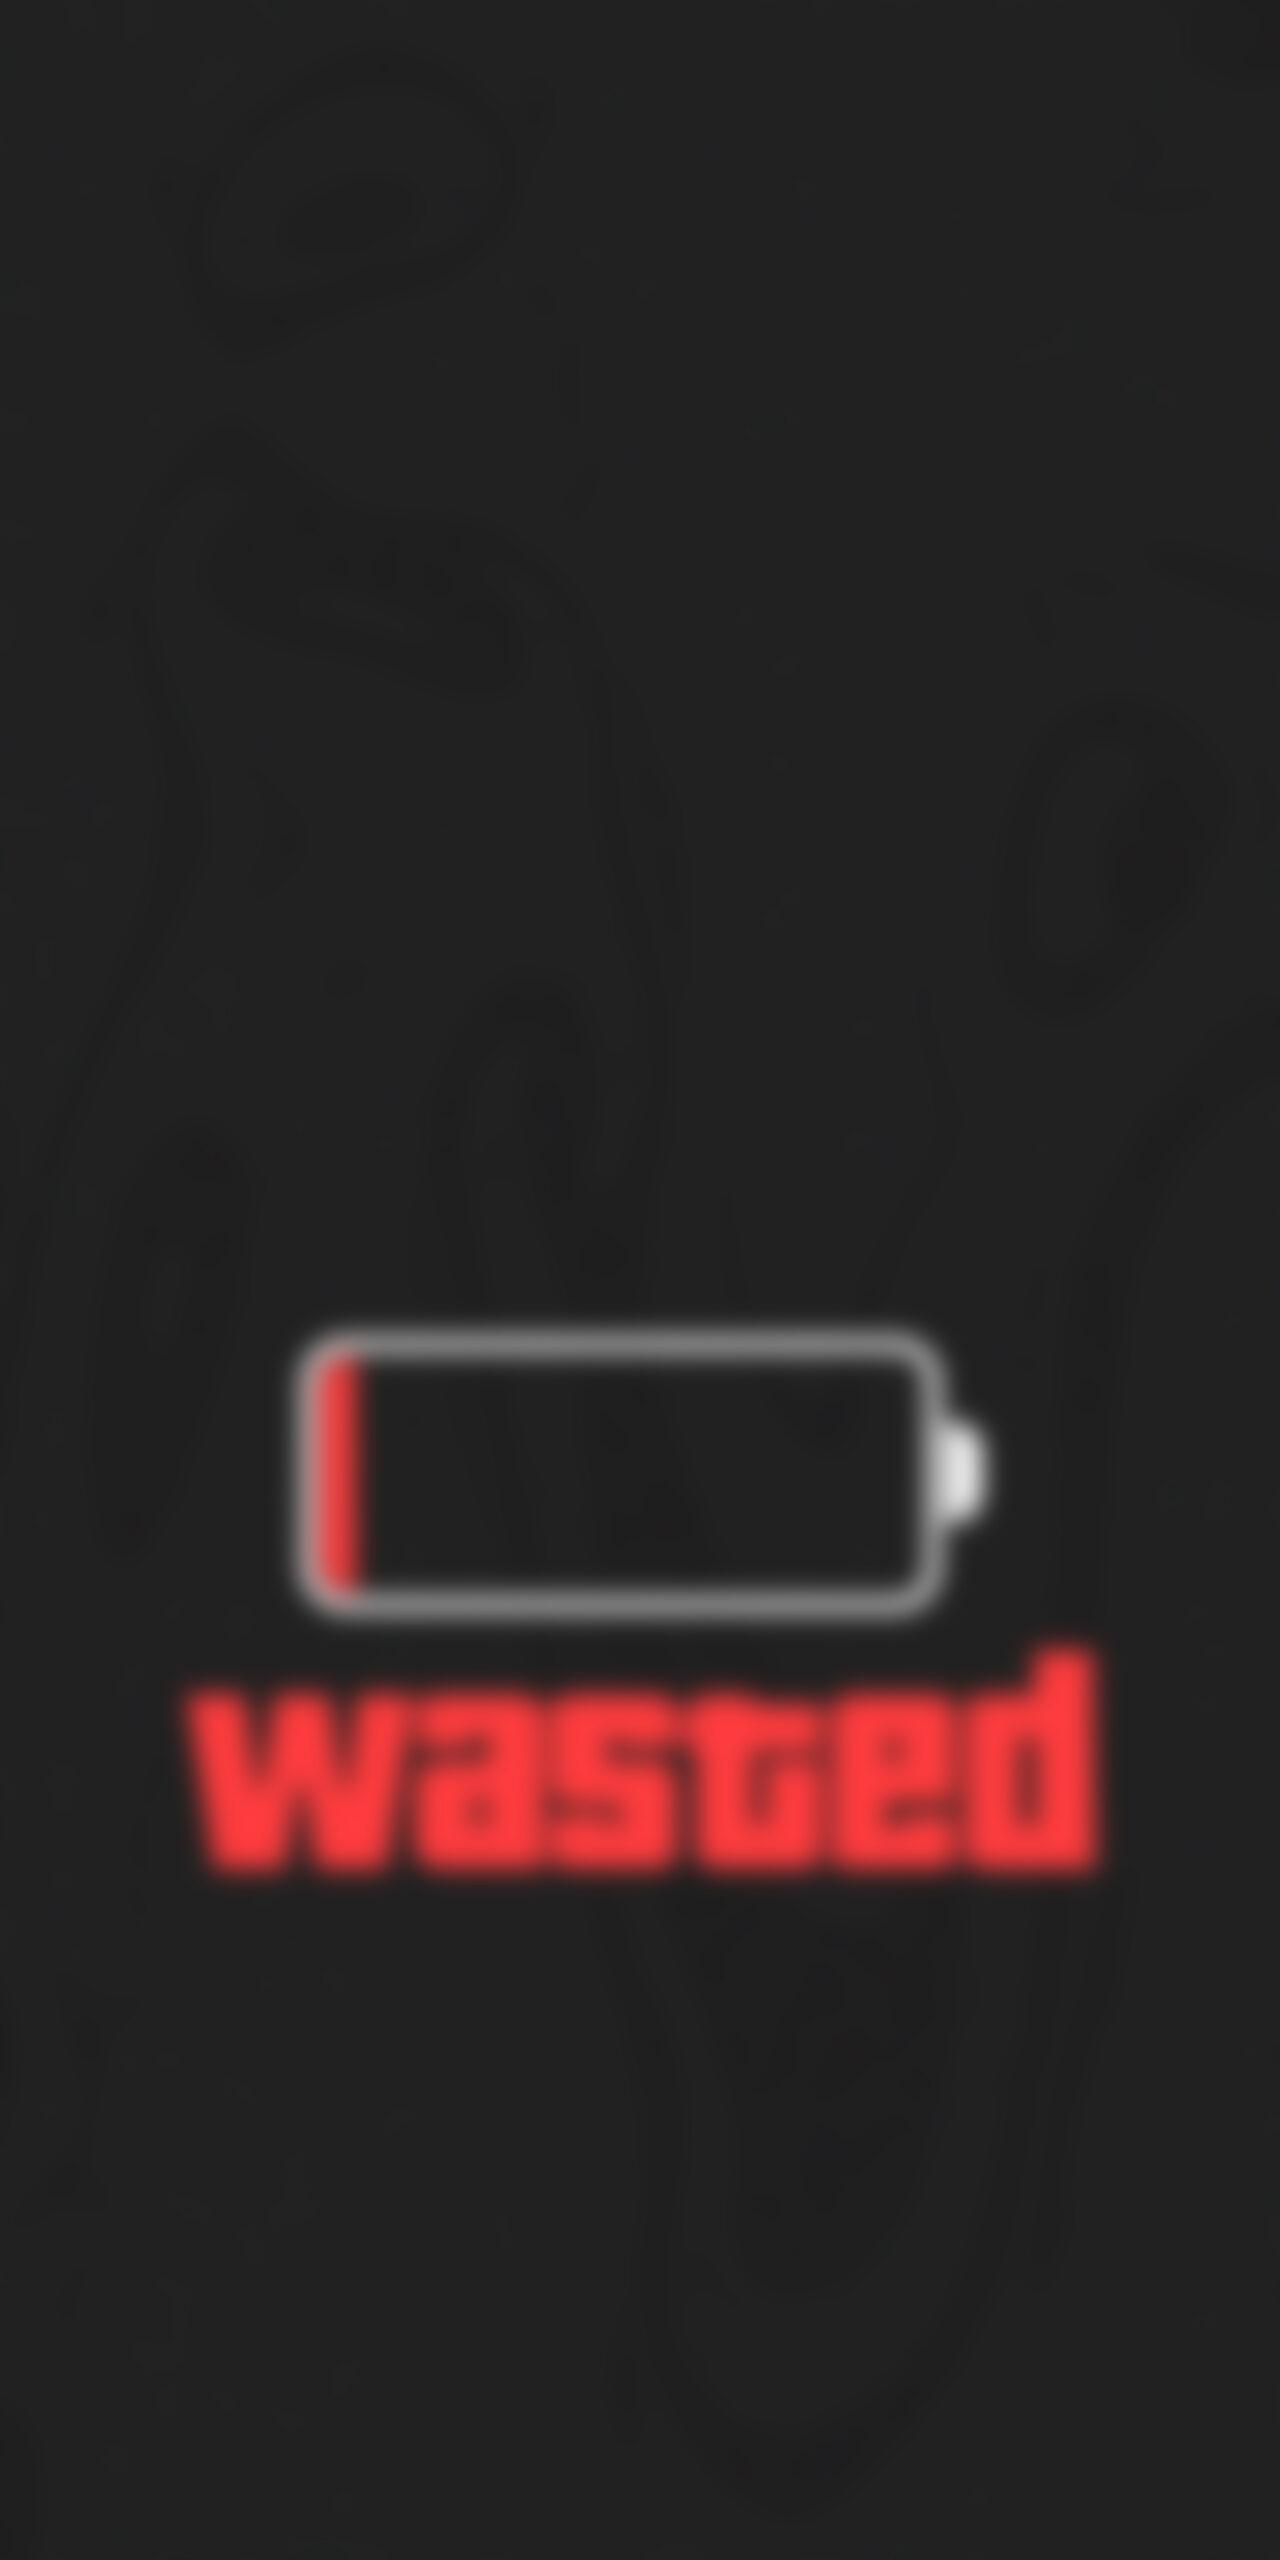 low battery wasted dark blur wallpaper